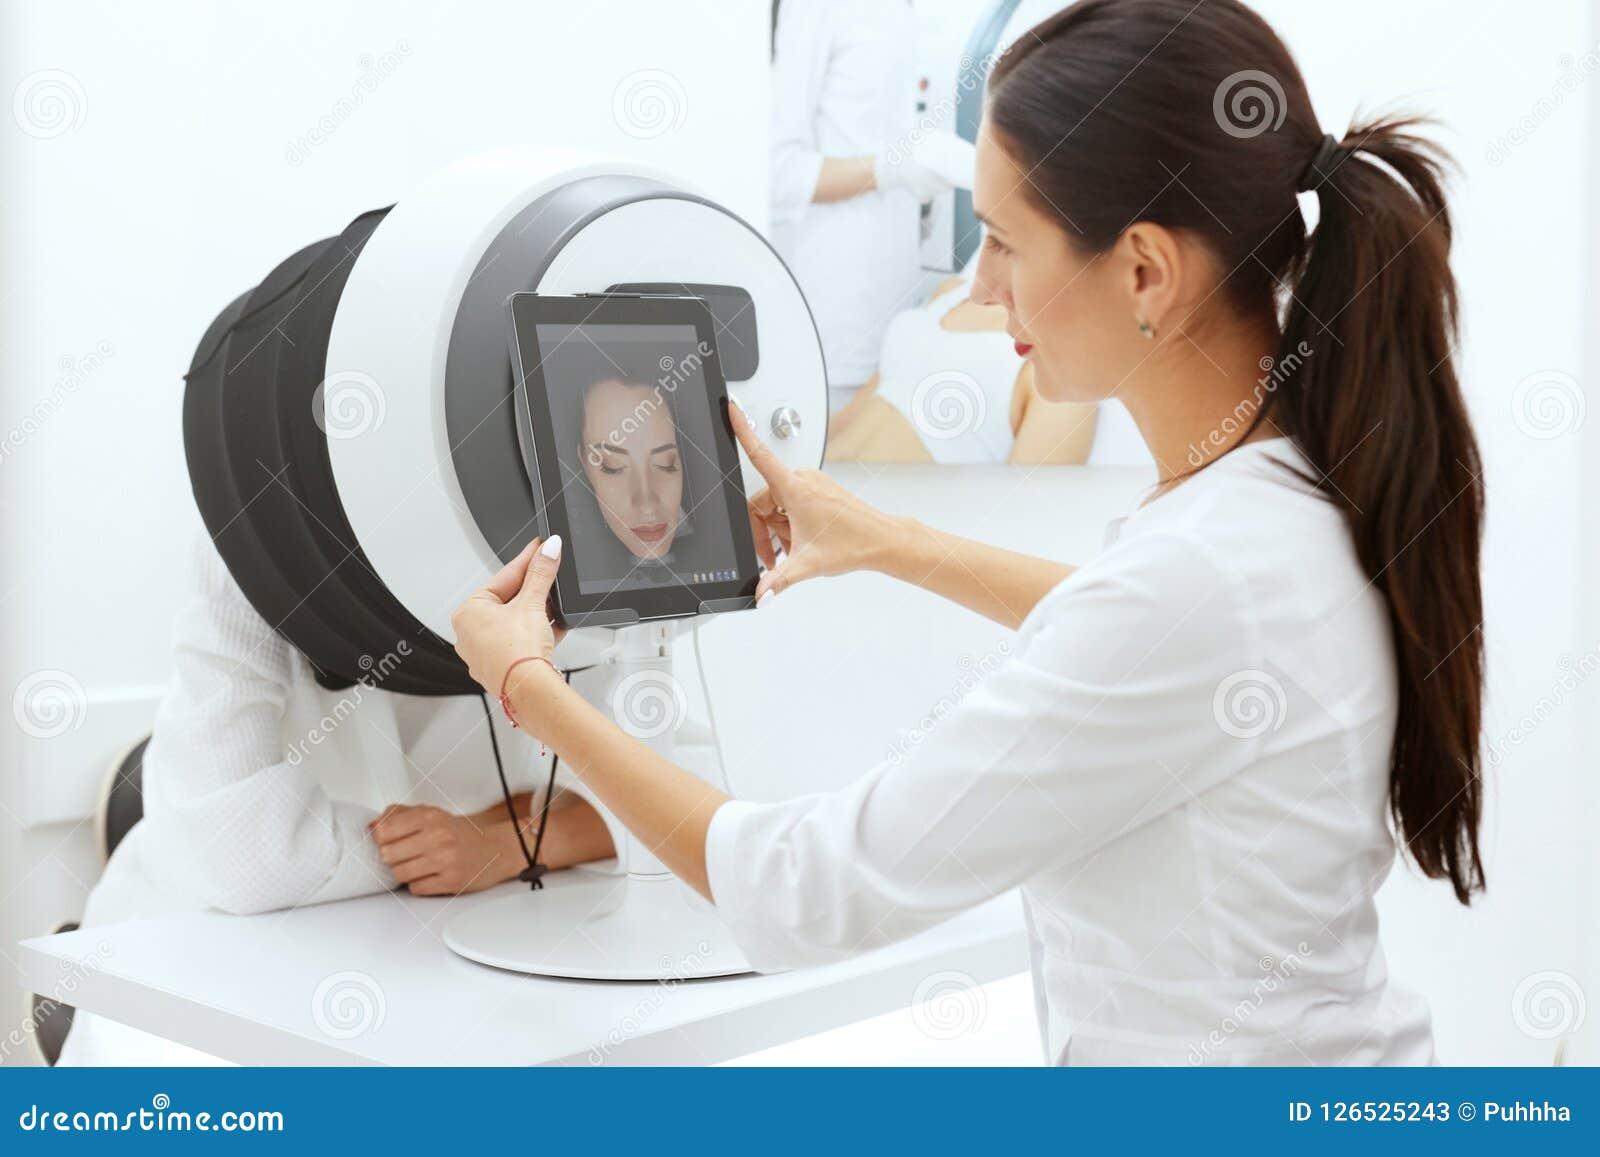 Gesichts-Haut-Analyse Frau am Cosmetology, der Haut-Diagnose tut